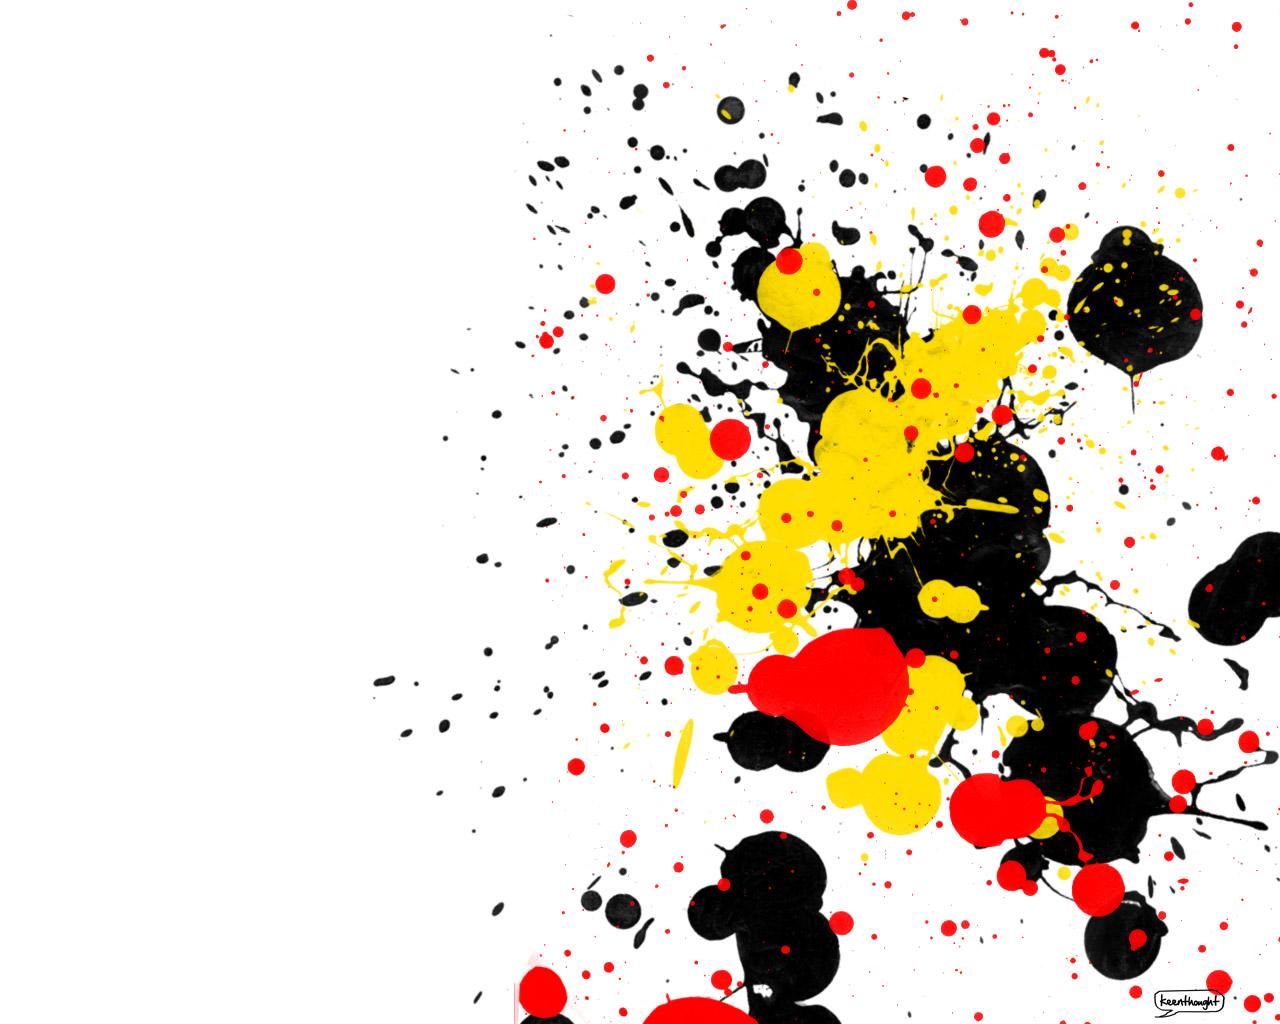 paintball splat backgrounds - photo #18